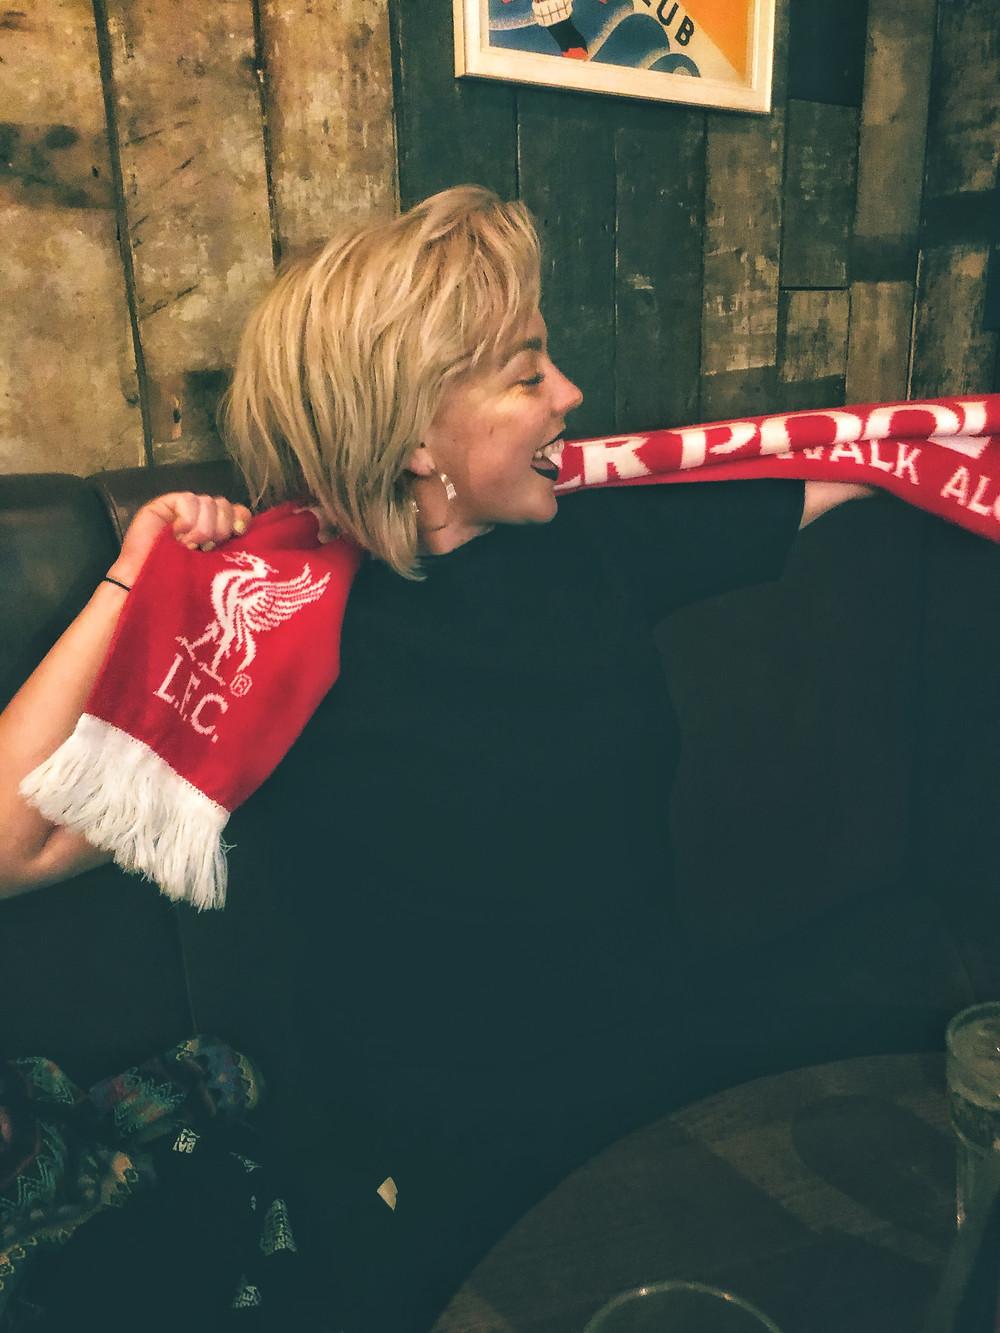 Blonde girl in English Pub, Liverpool FC Scarf